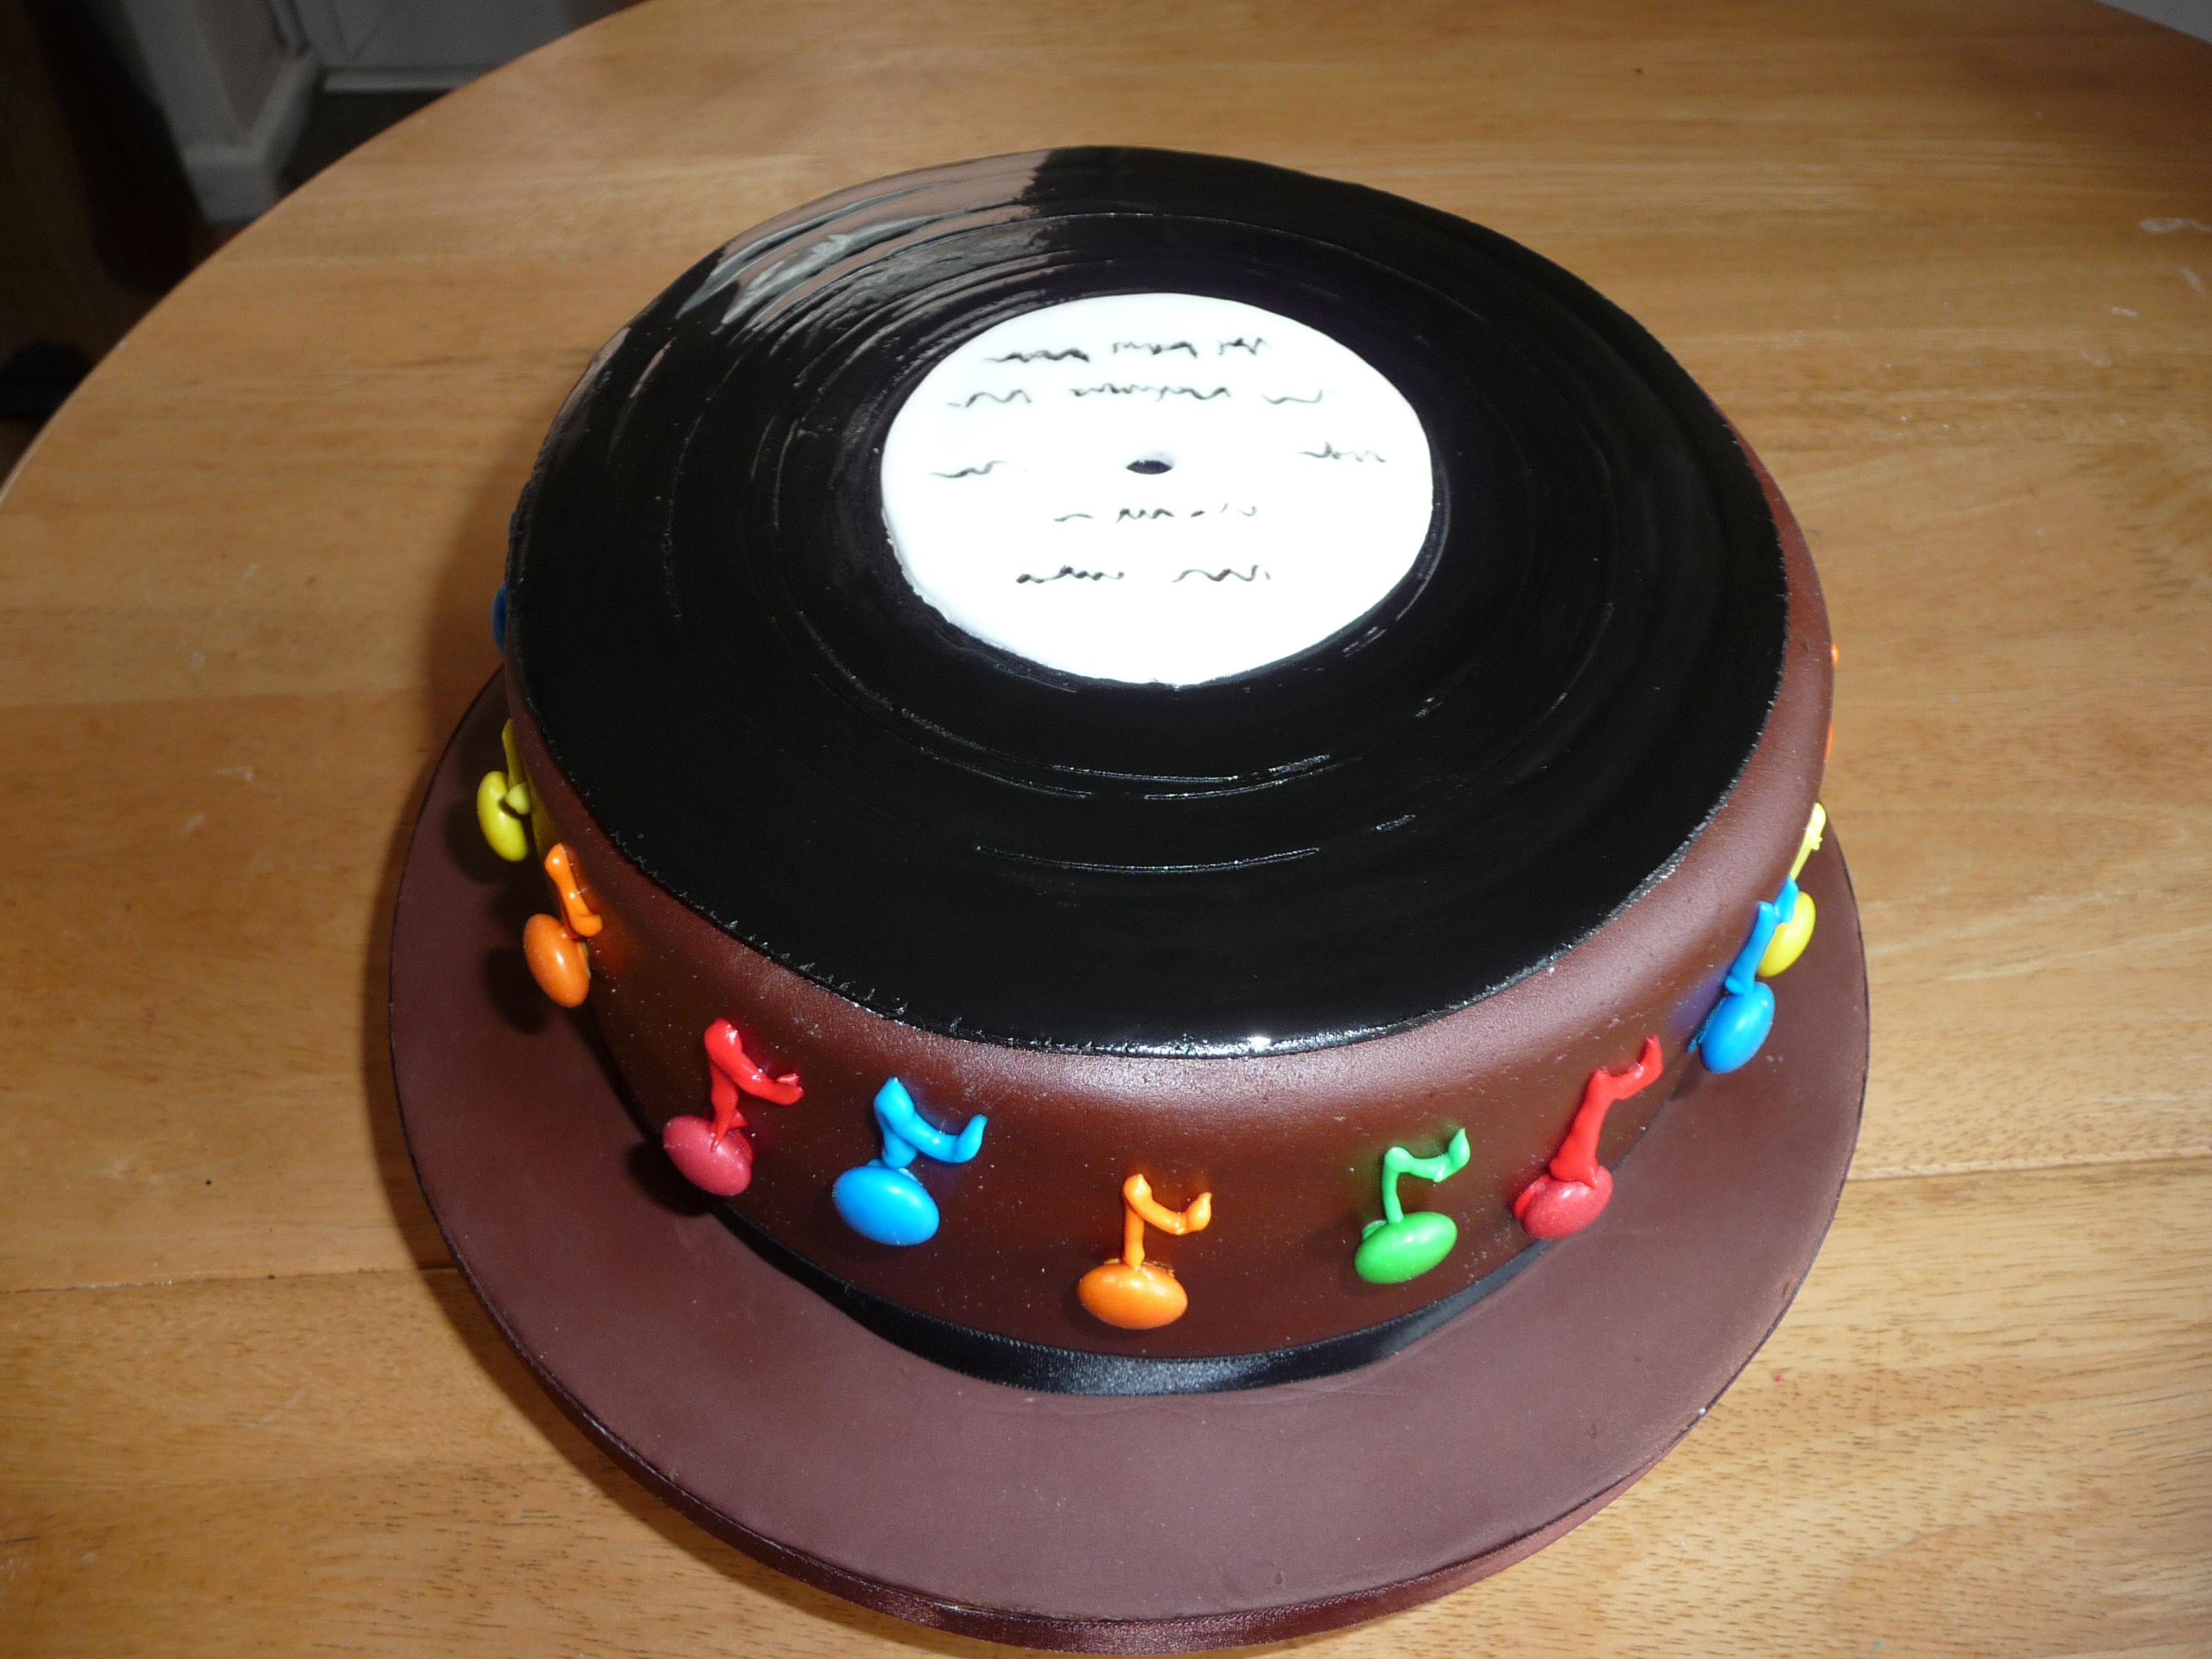 Vinyl Record Cake Decorations